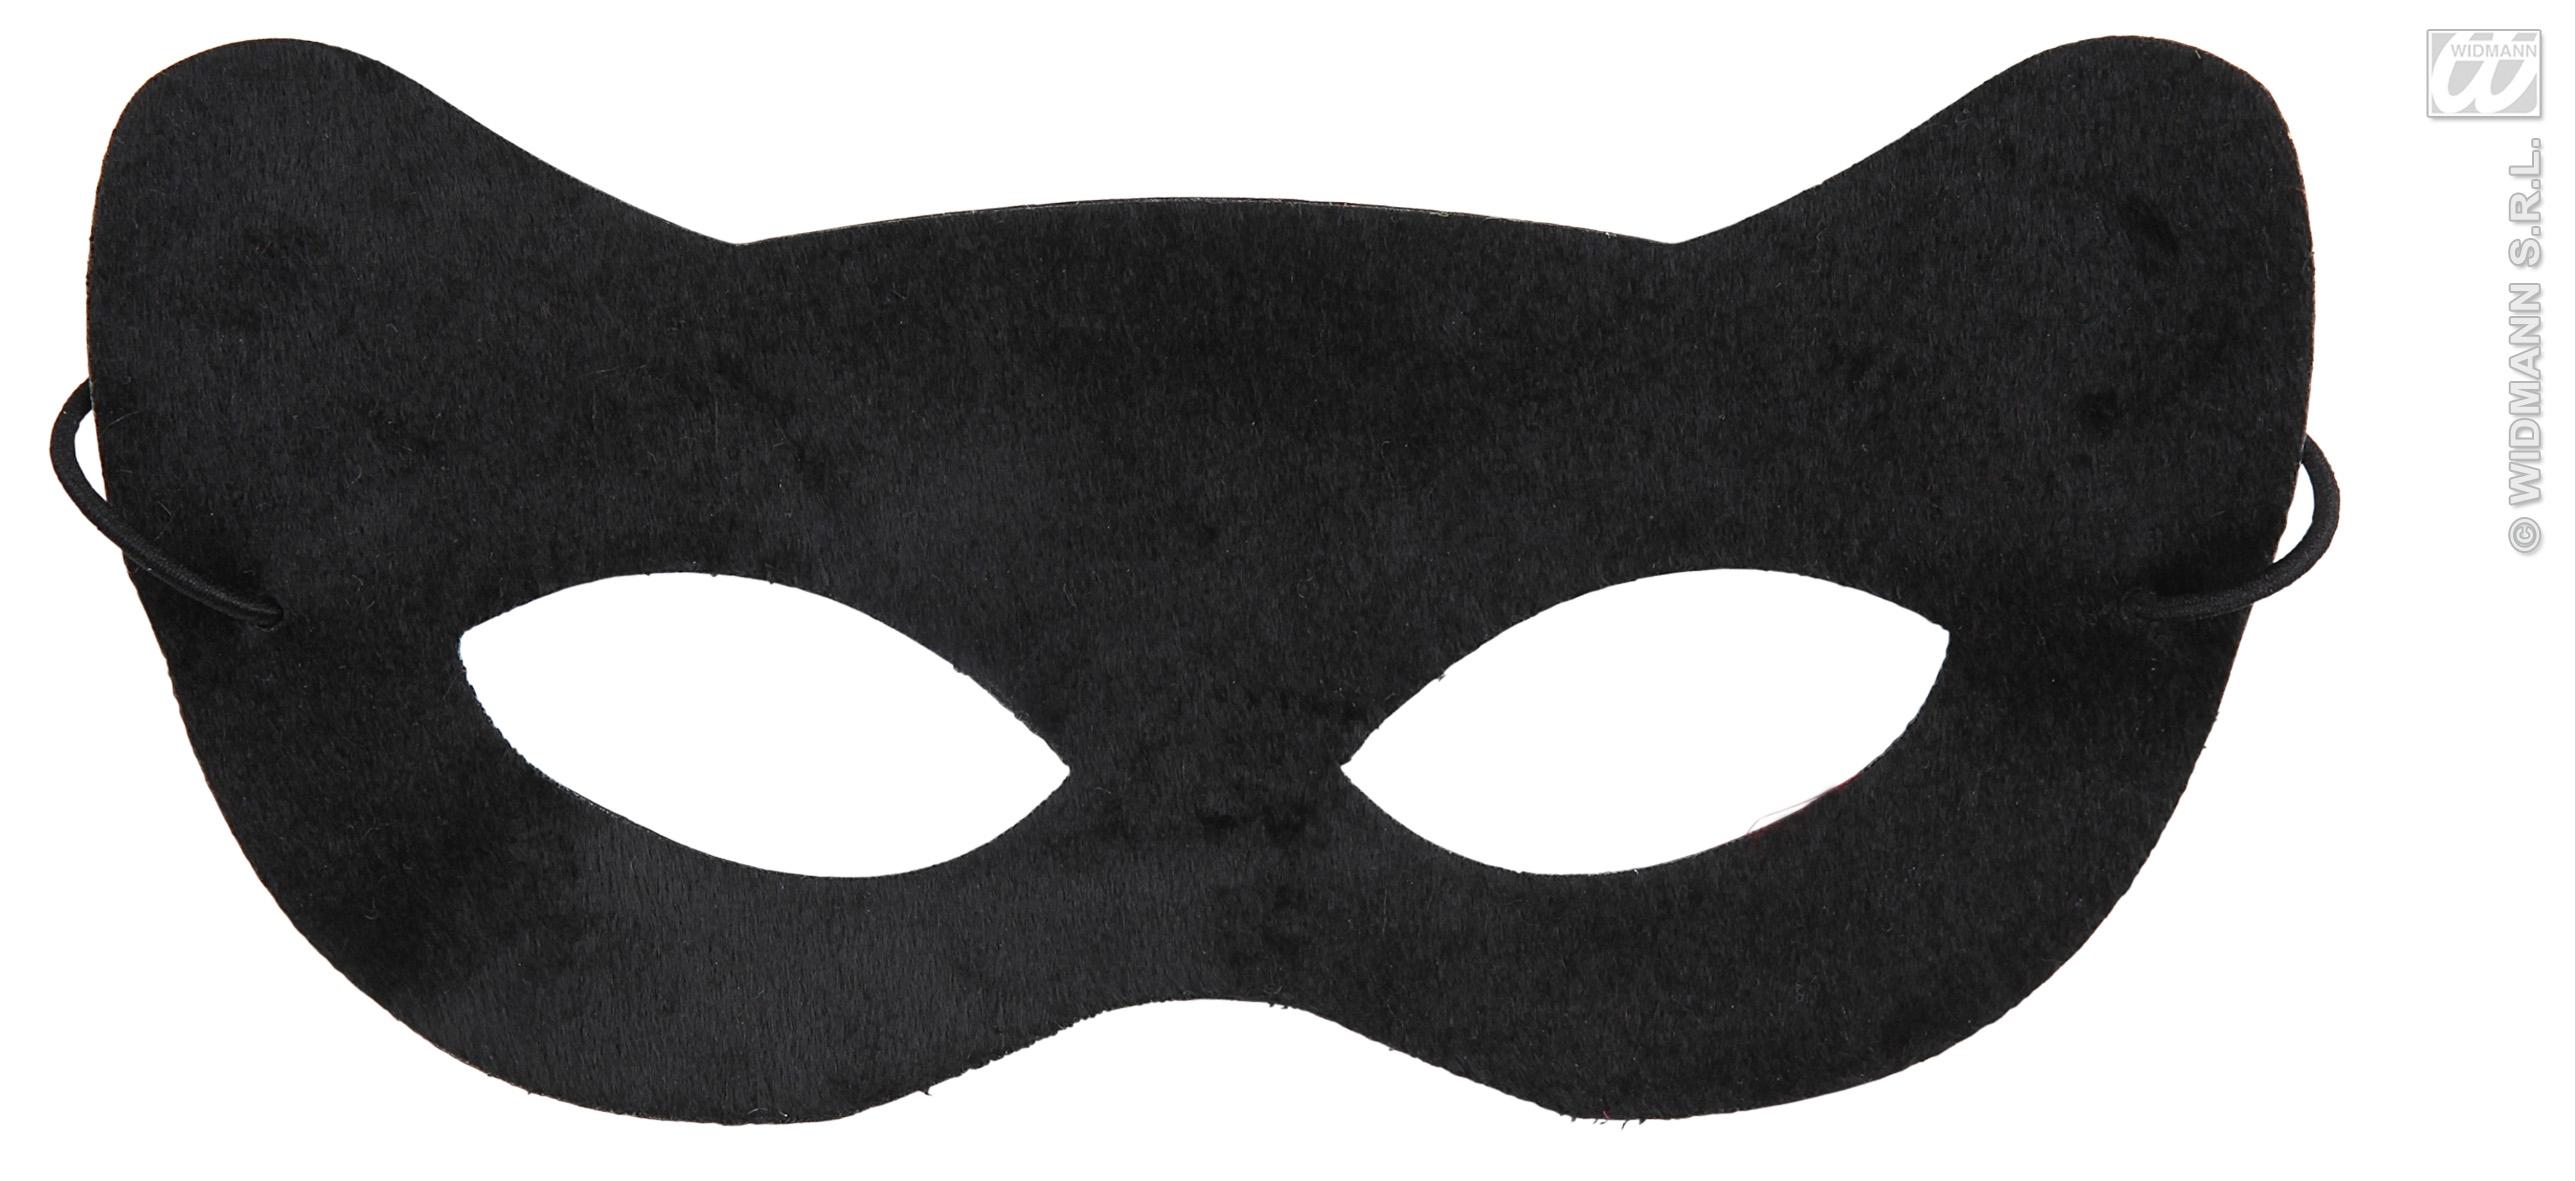 sentinel black cat eye mask eyemask with ears catwoman halloween fancy dress - Black Eye Mask Halloween